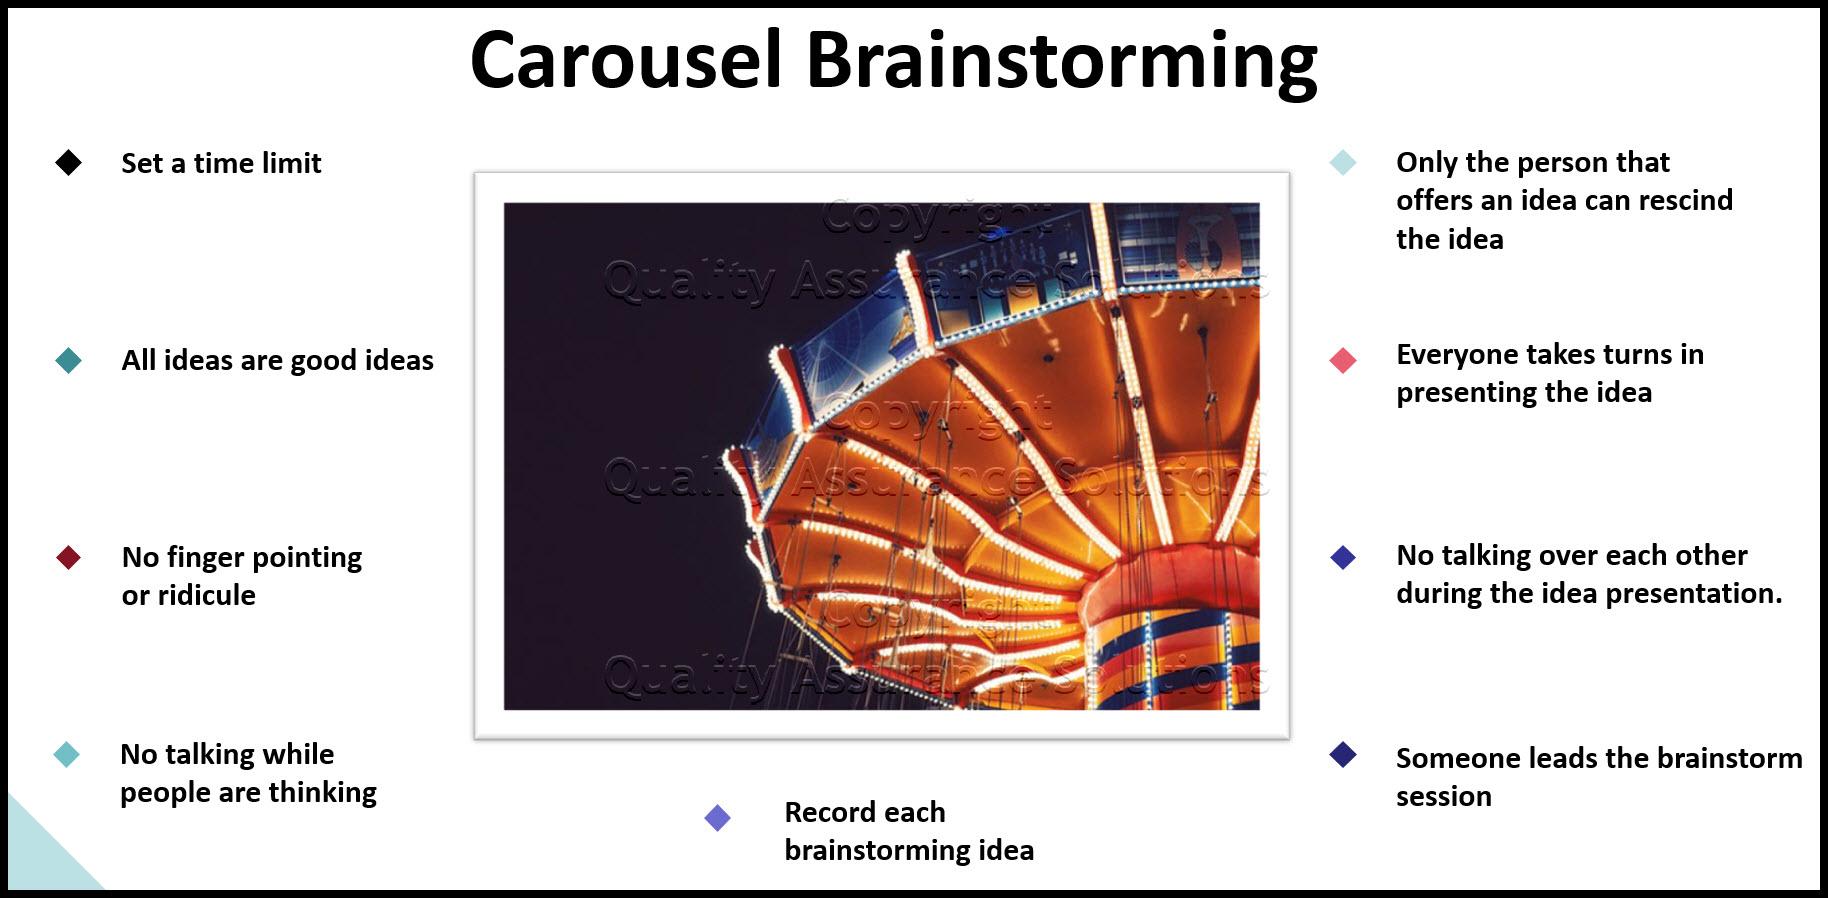 Carousel Brainstorming slide